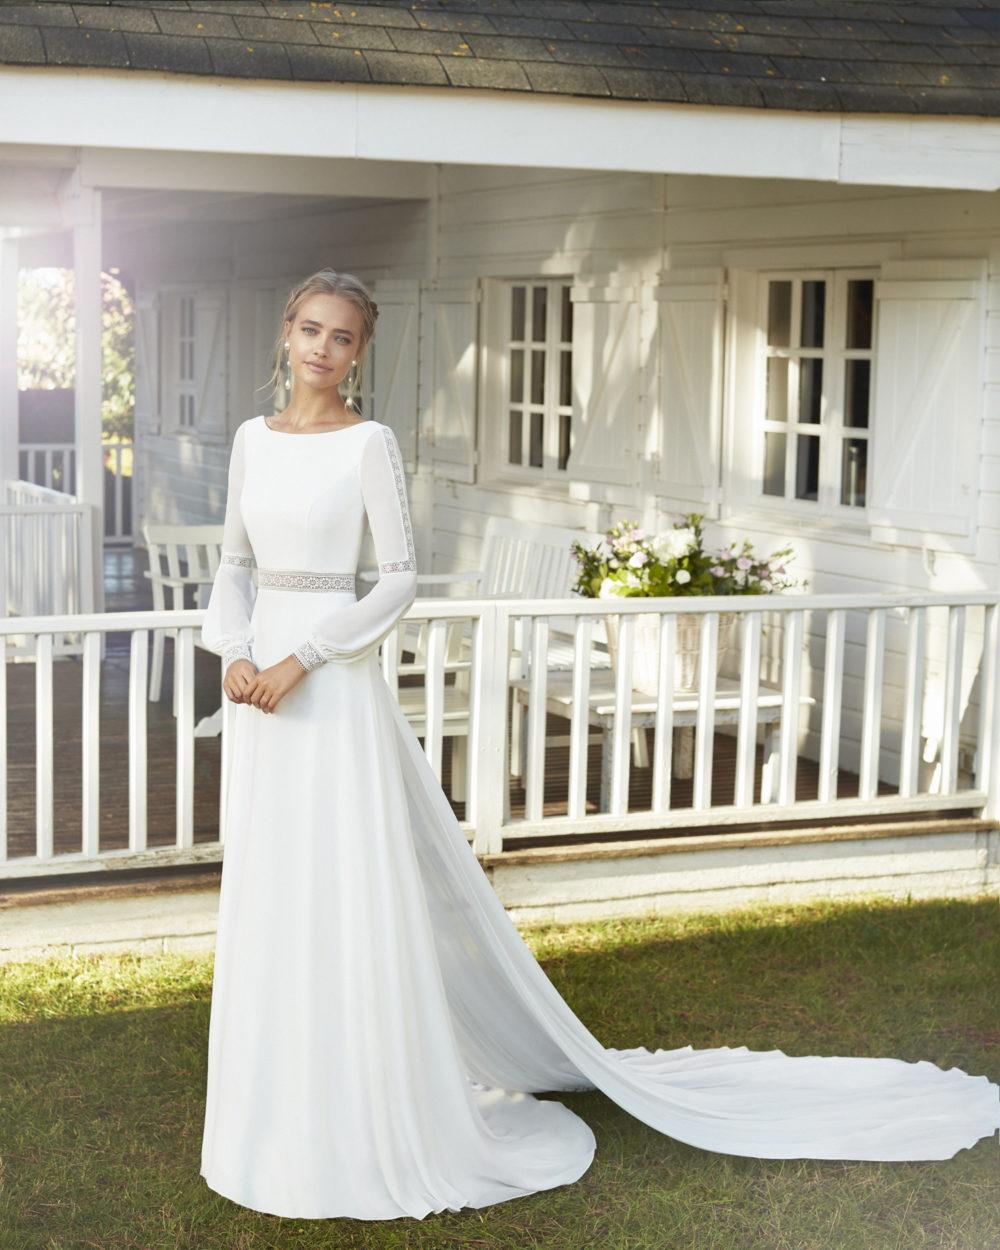 Mariages: abito da sposa Rosa Clarà 2020 a Vicenza, Verona, Padova, Veneto 4A205 CADIRA